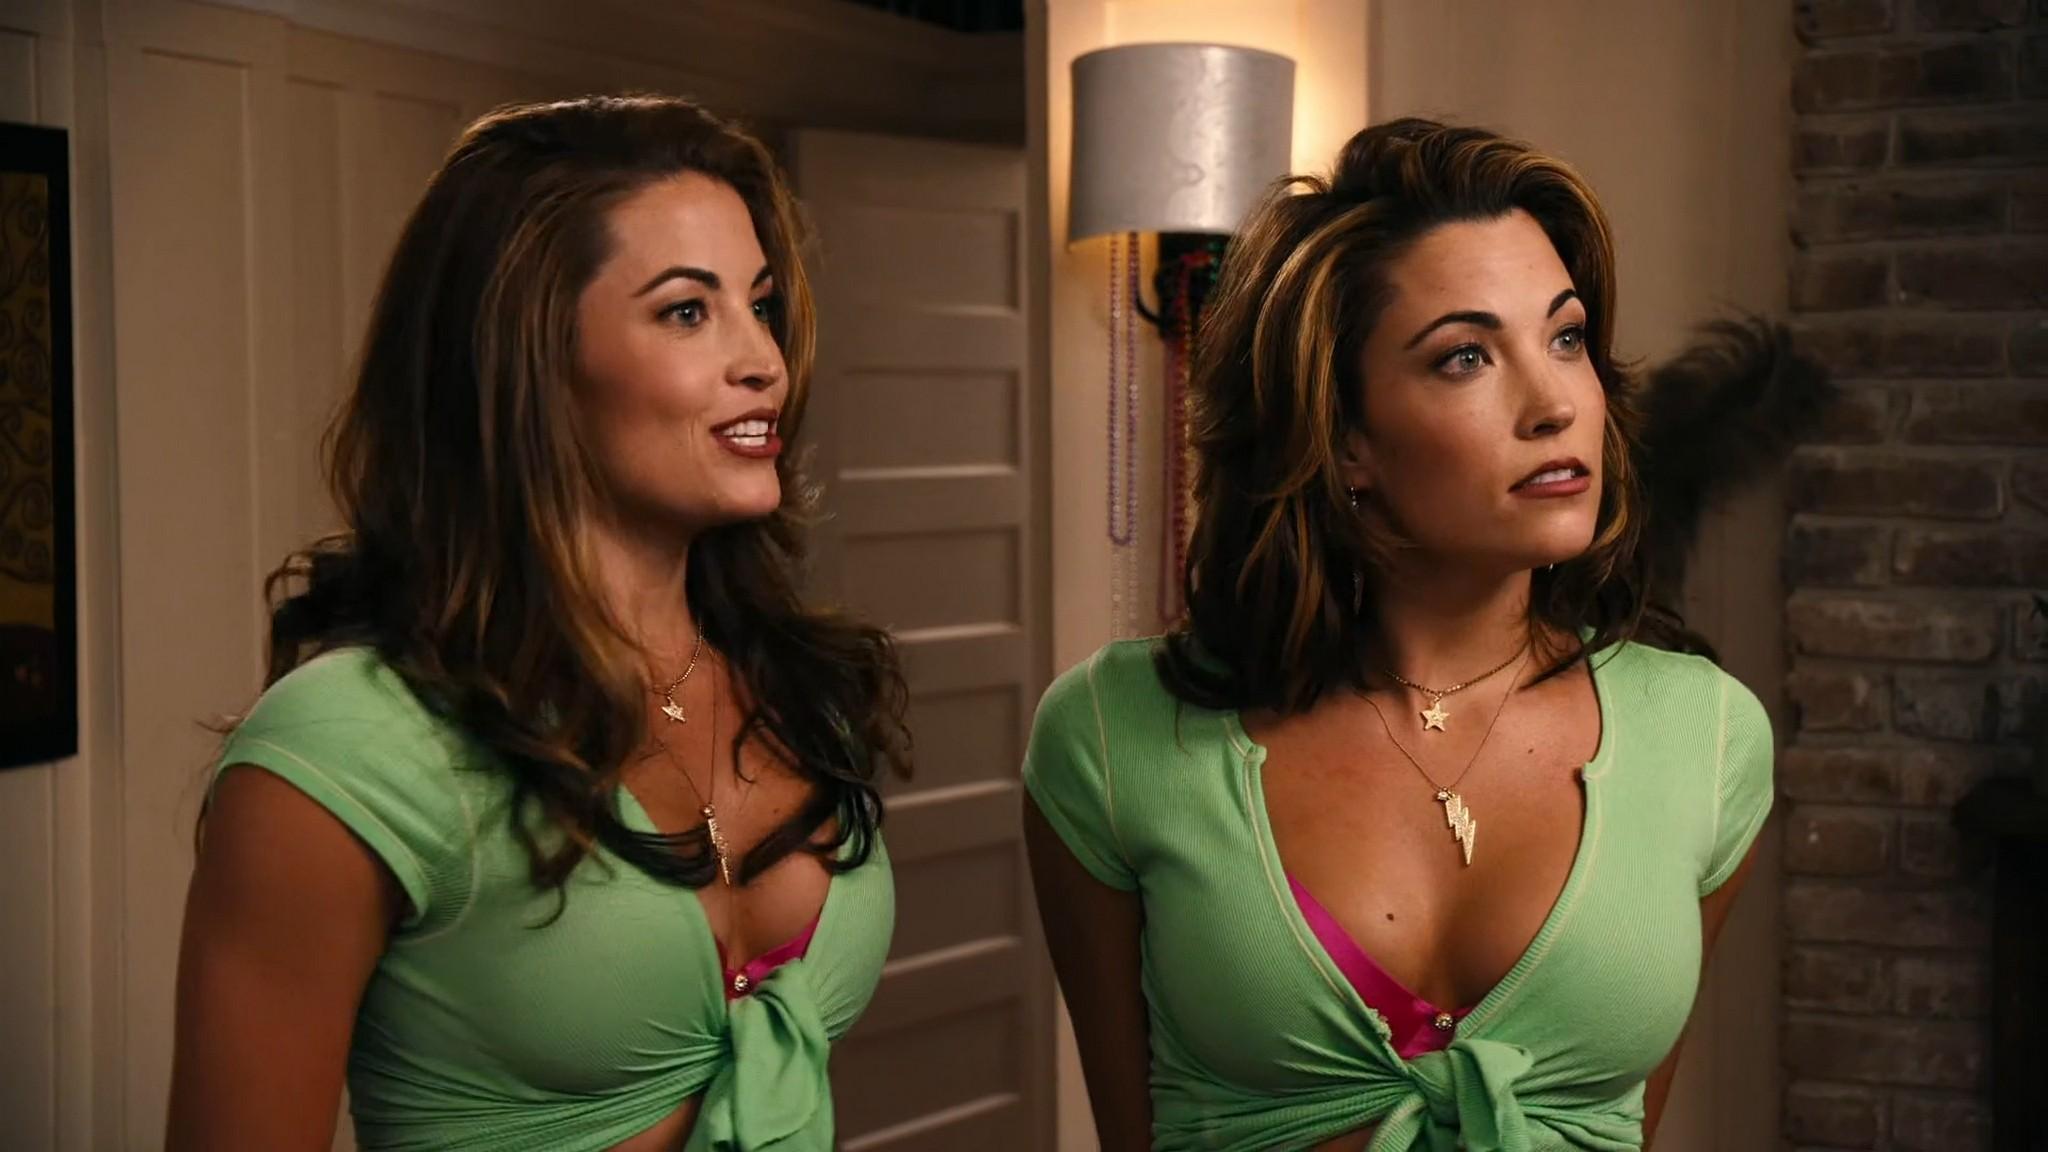 Danneel Ackles nude Carmen Electra, Arielle Kebbel, sexy otherrs nude and hot - Mardi Gras: Spring Break (2011) HD 1080p WEb (7)